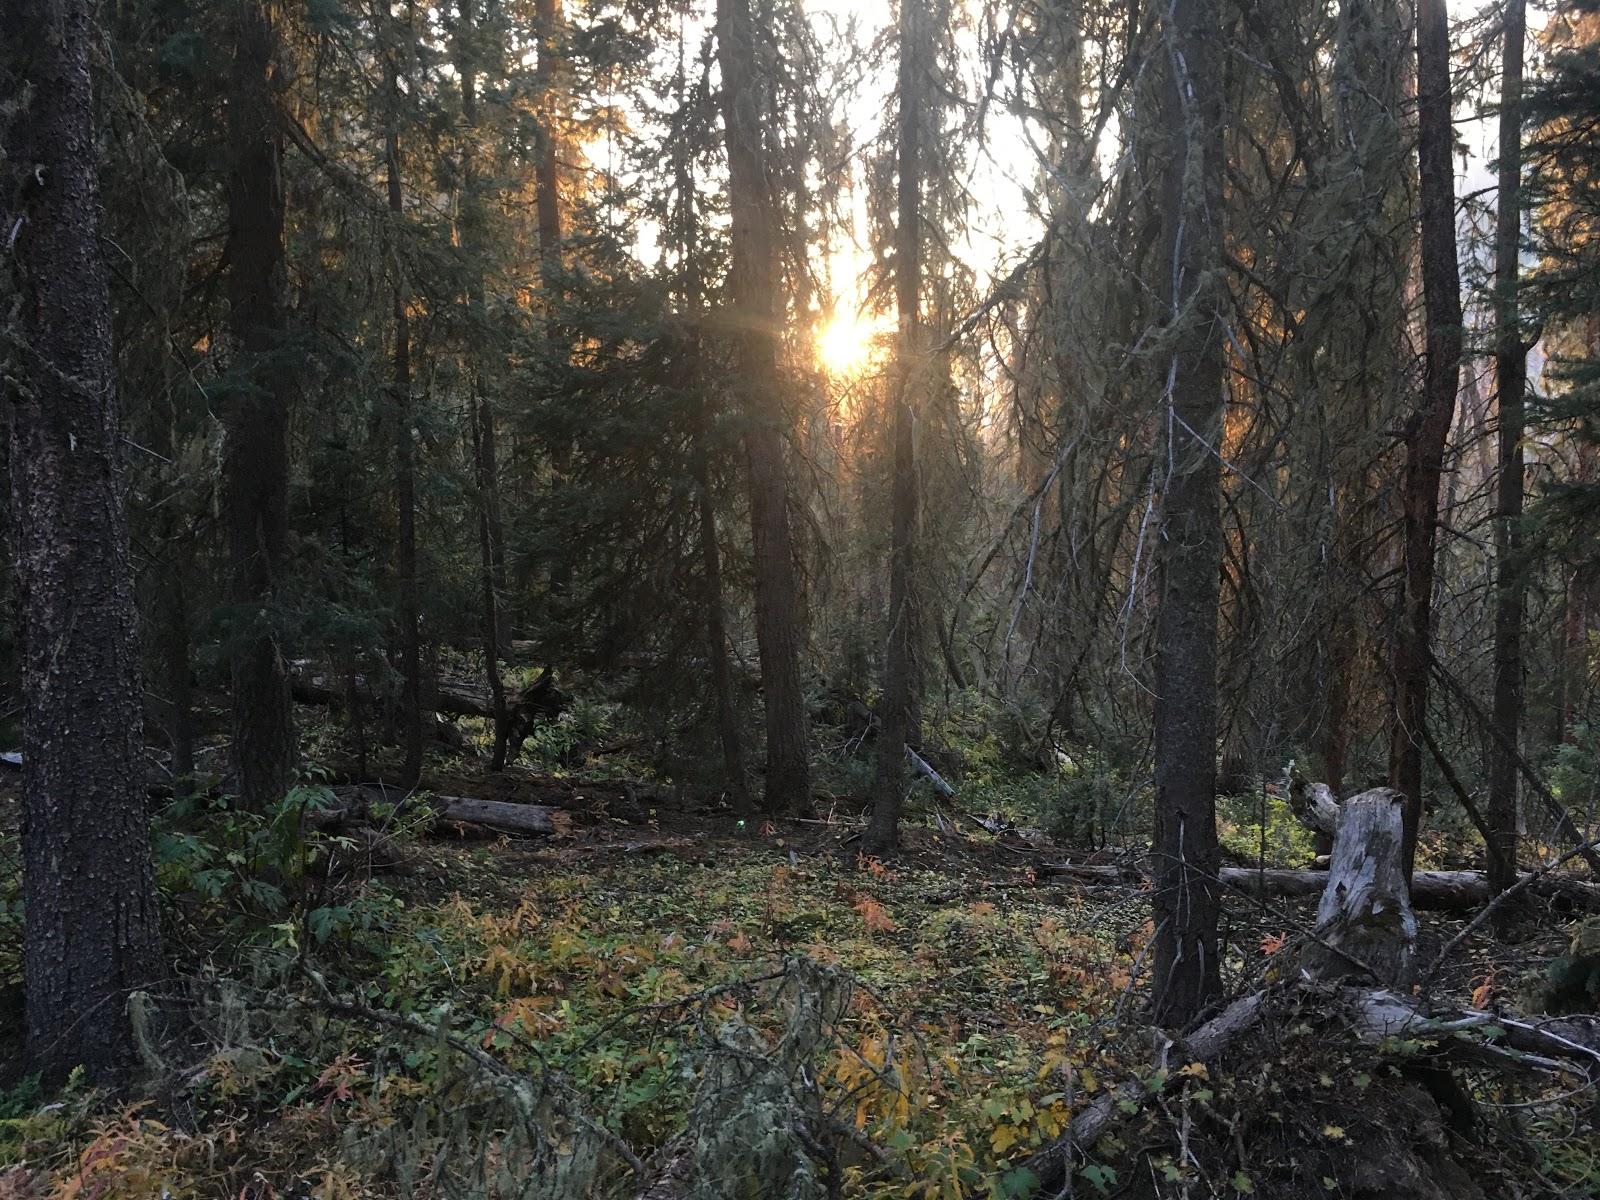 The sun setting in trees!